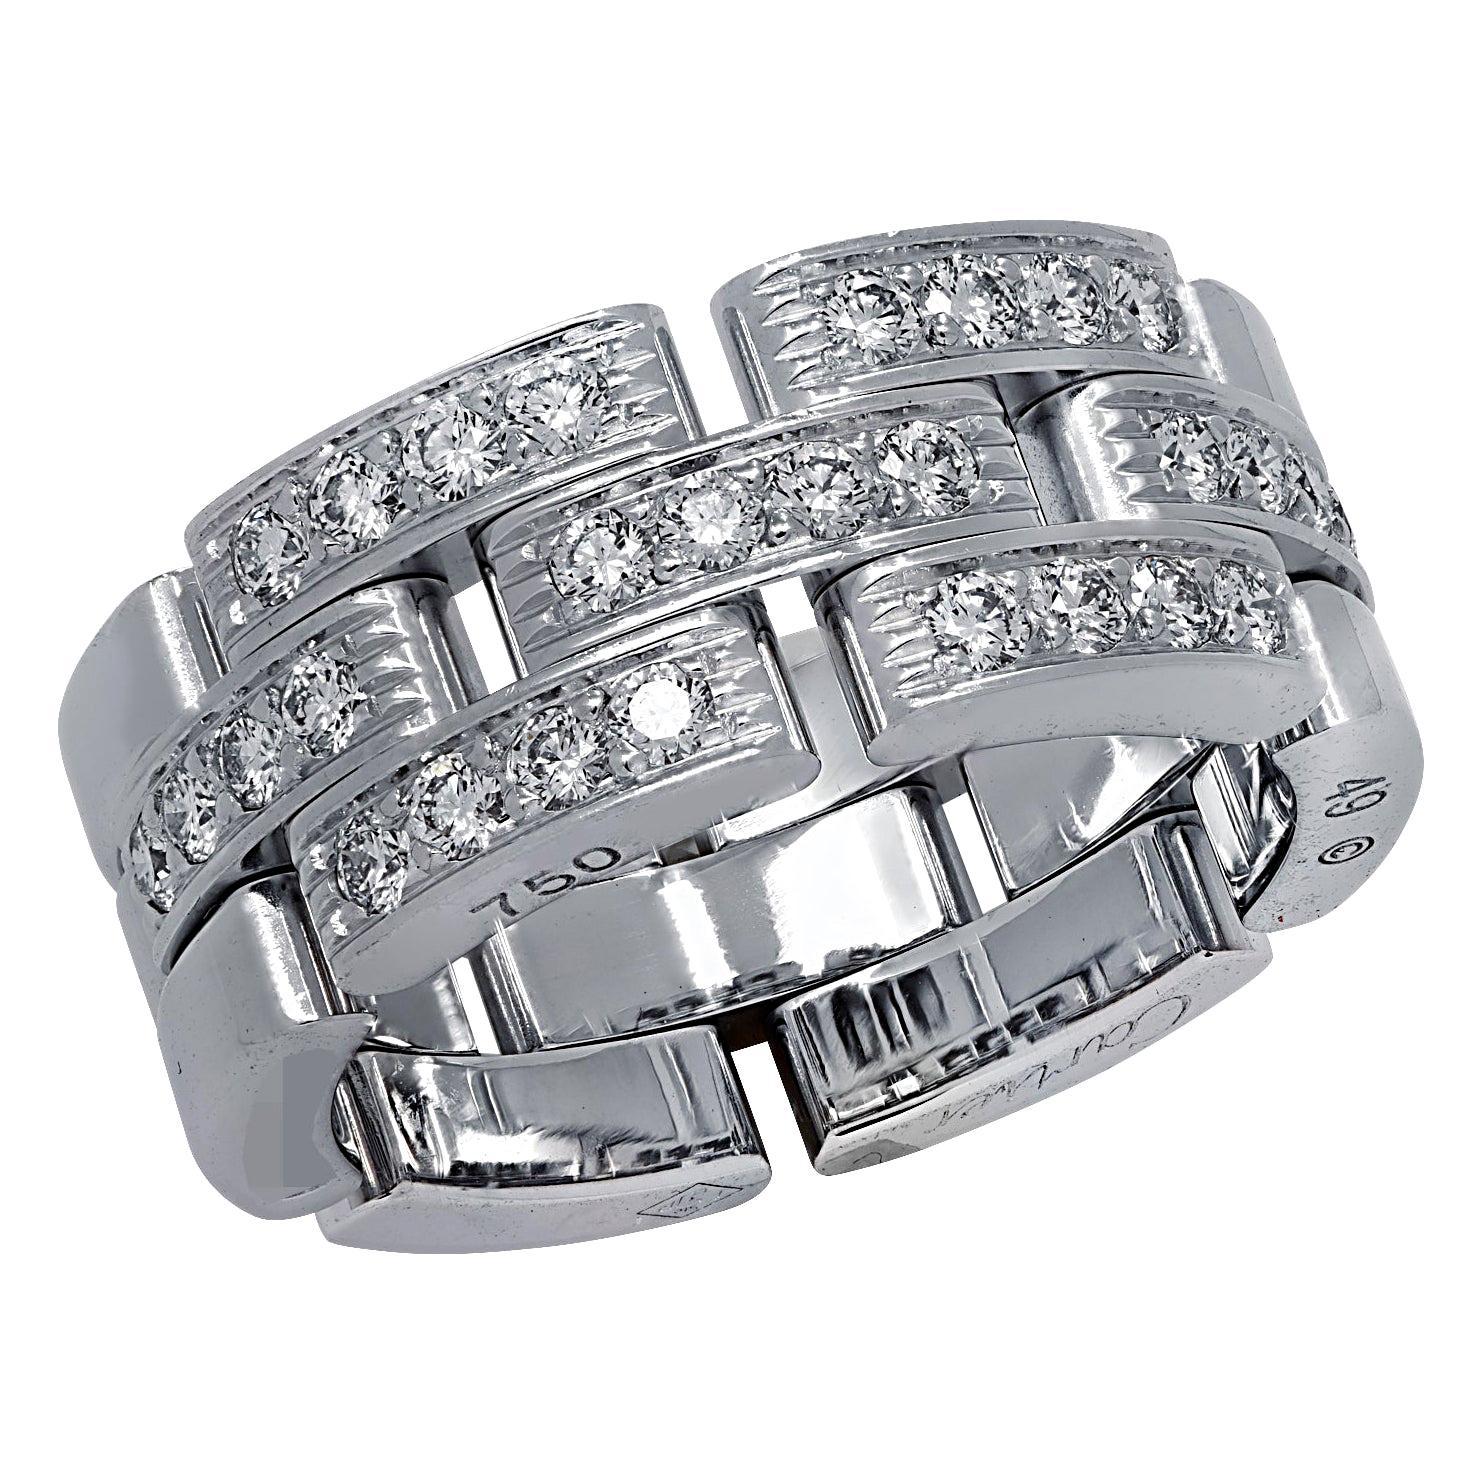 Cartier Maillon Panthere Diamond Wedding Band